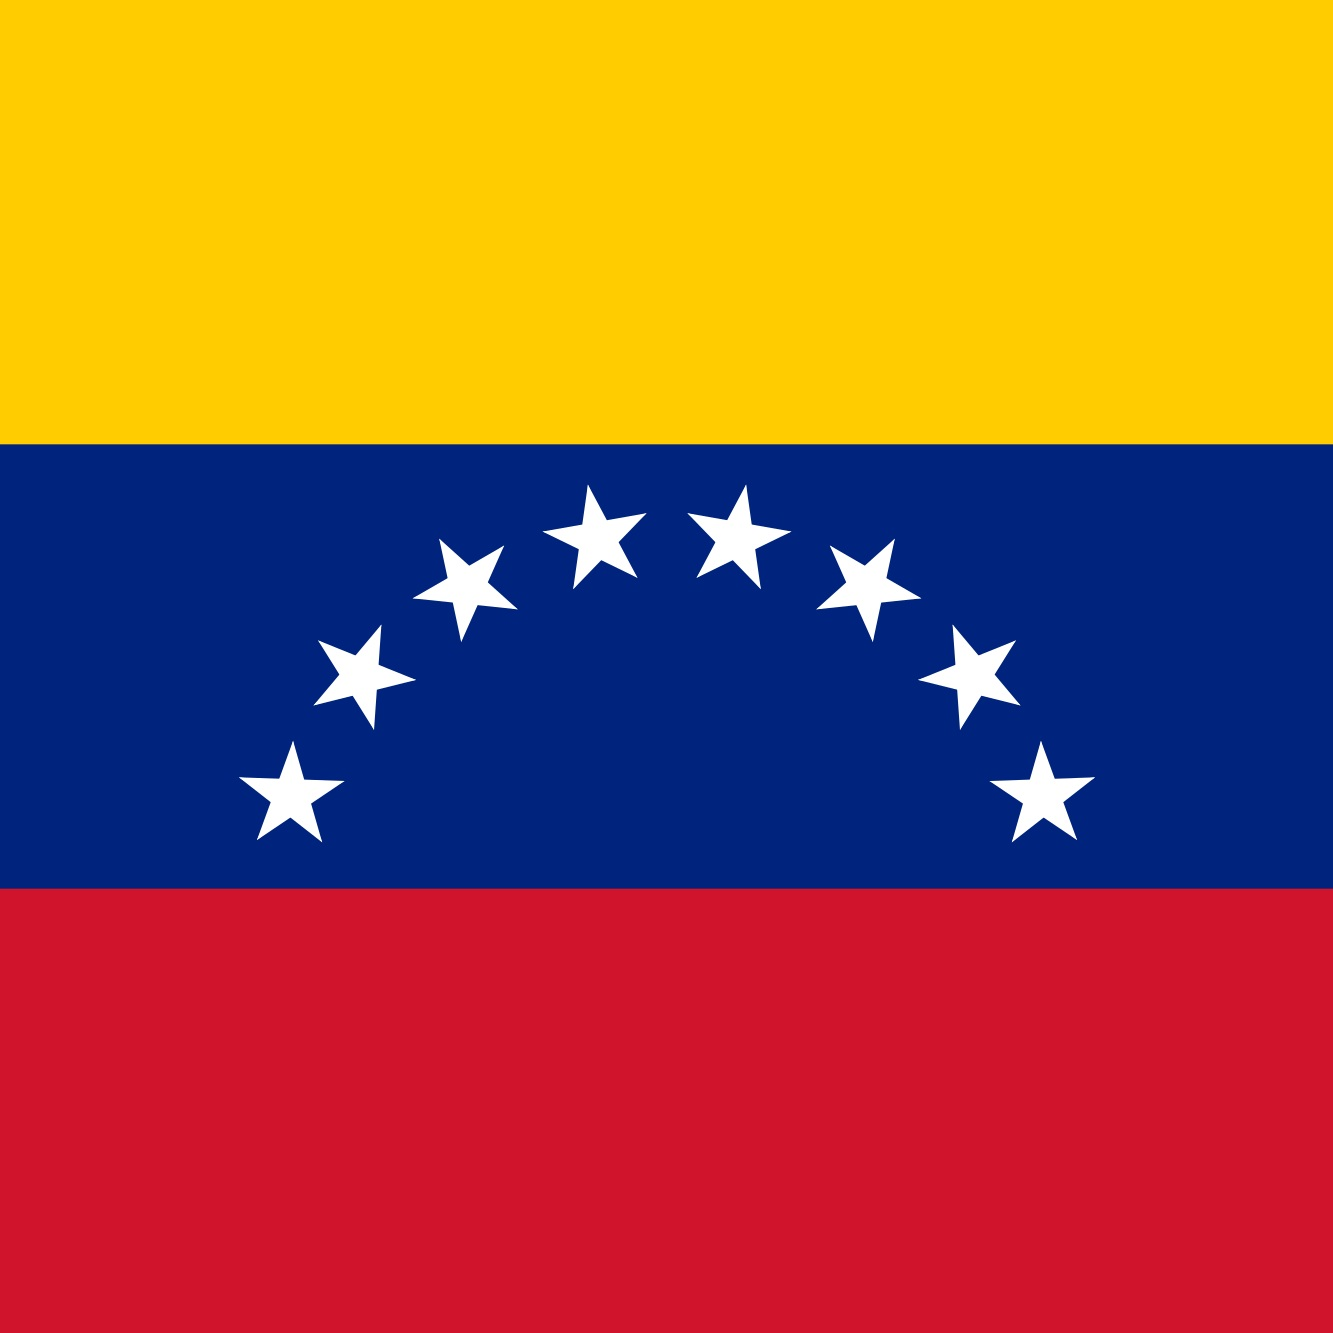 Venezuela 2020: Rebuilding a Nation - Chair: Bobo StankovikjCrisis Director: Olivia Ott